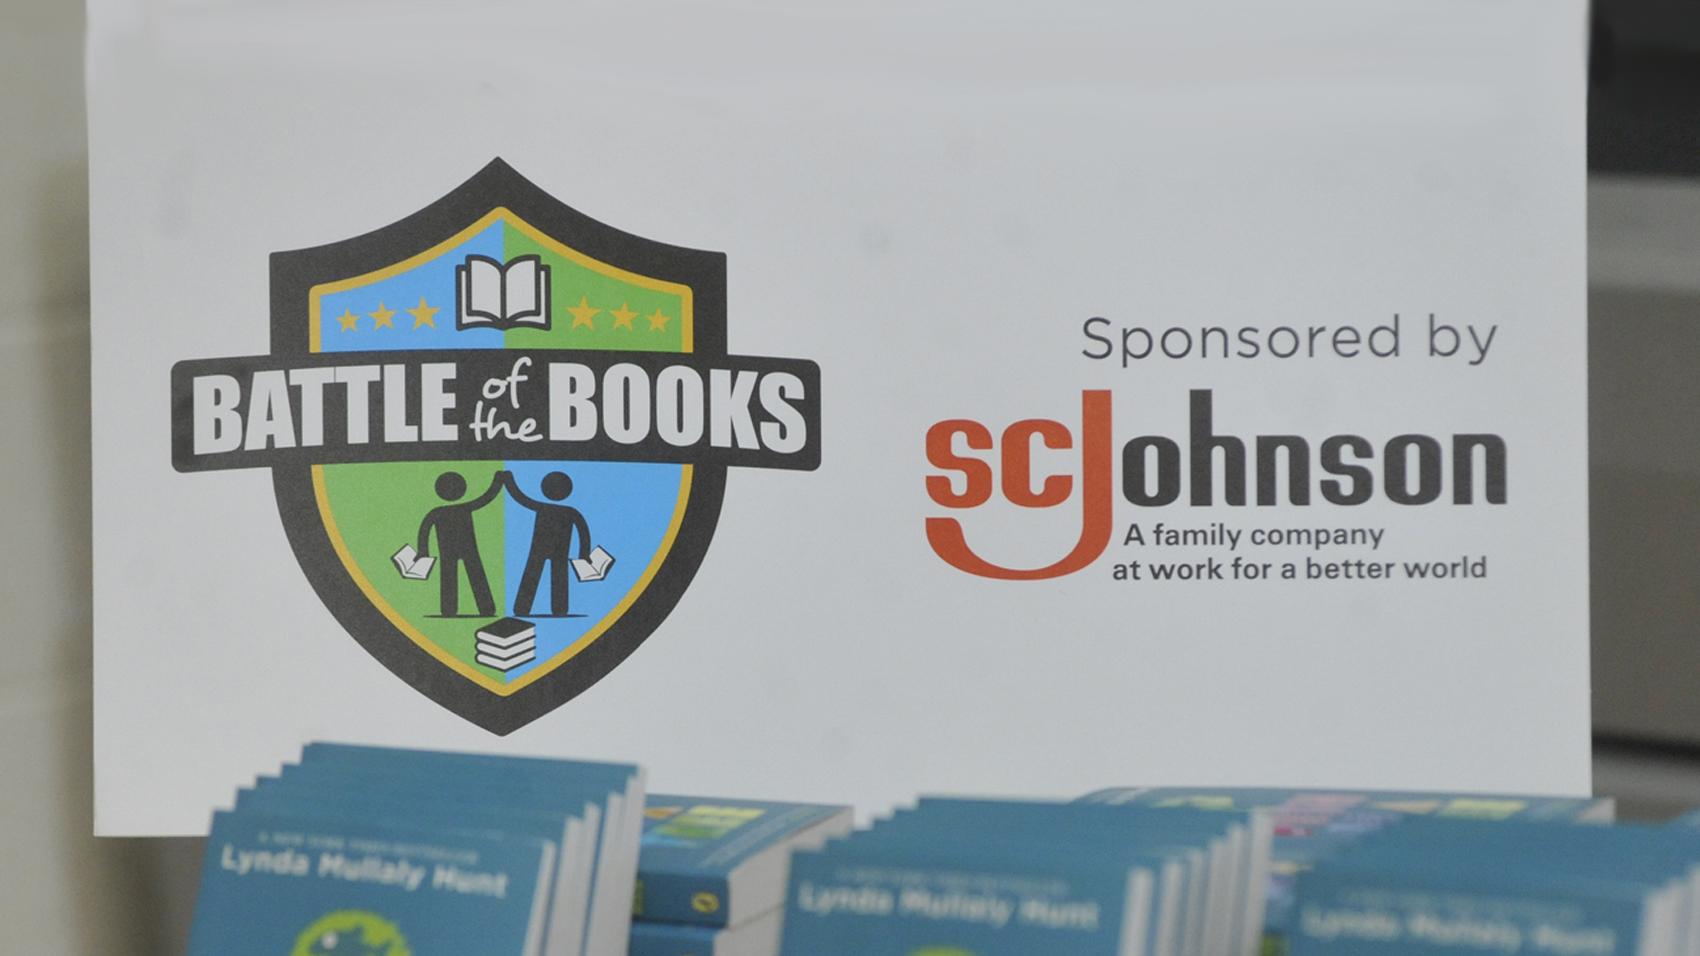 Battle of the Books sponsored by SC Johnson